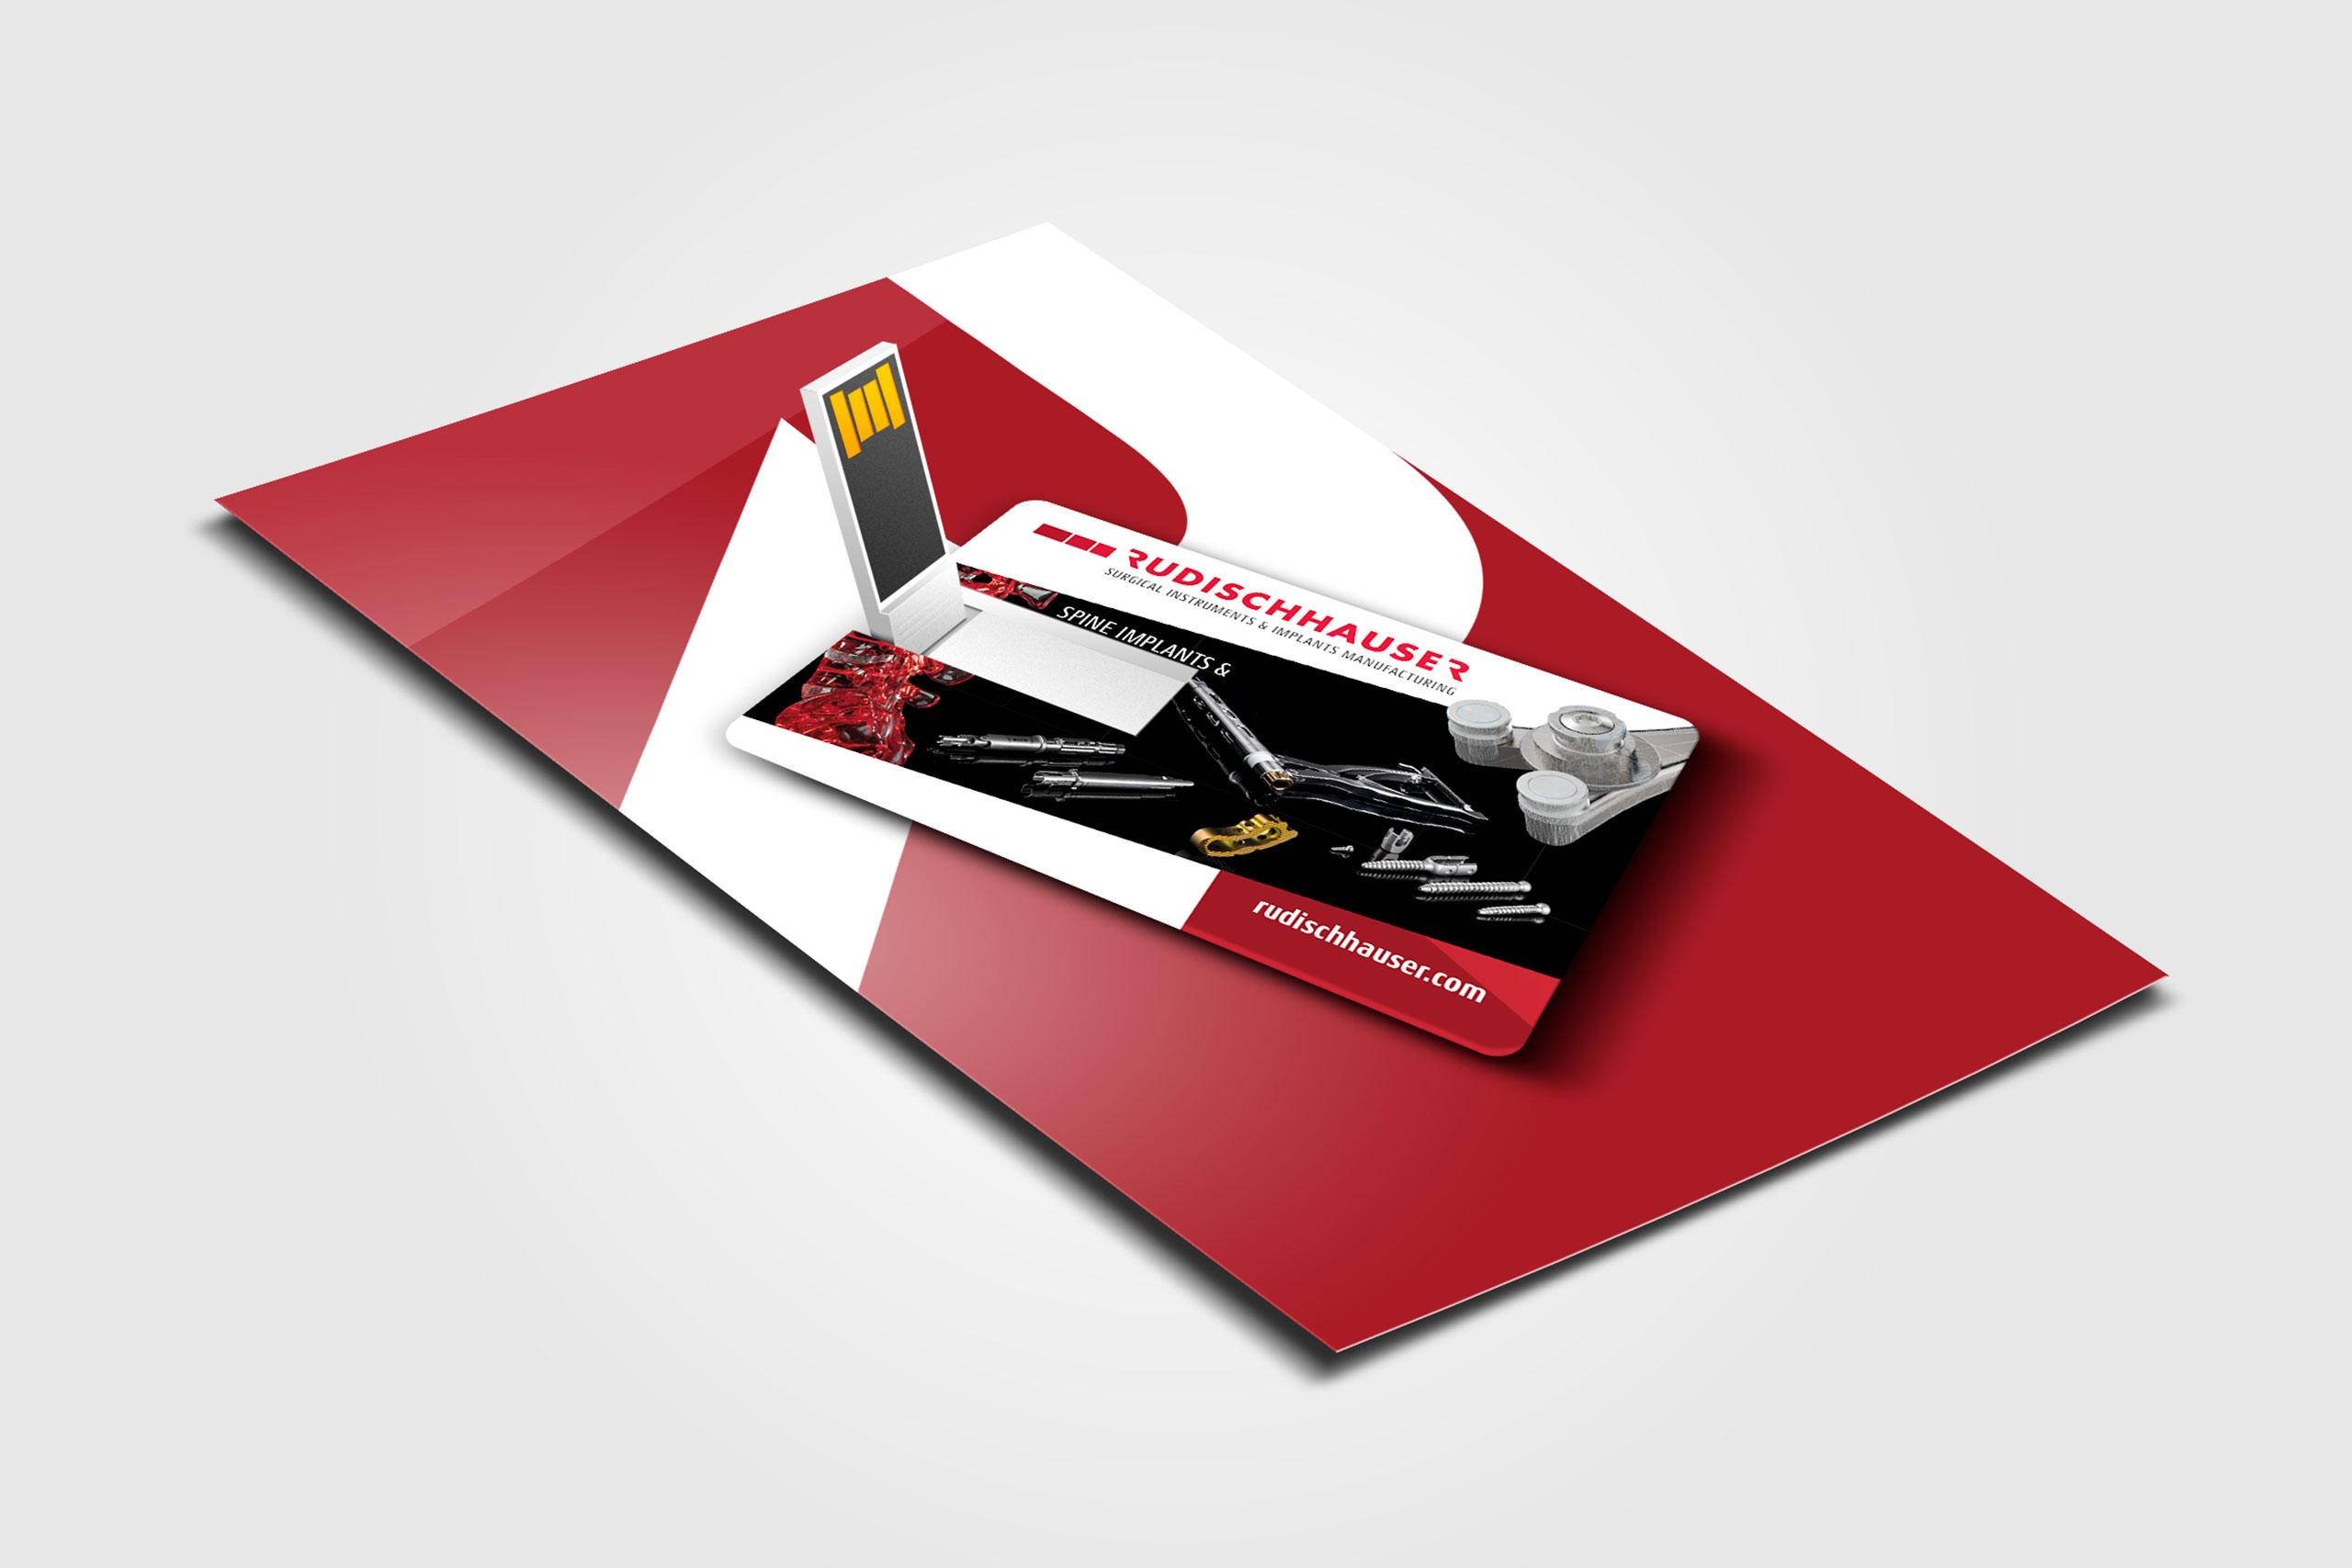 Rudischhauser Usb Visitenkarten Webtemps Werbeagentur